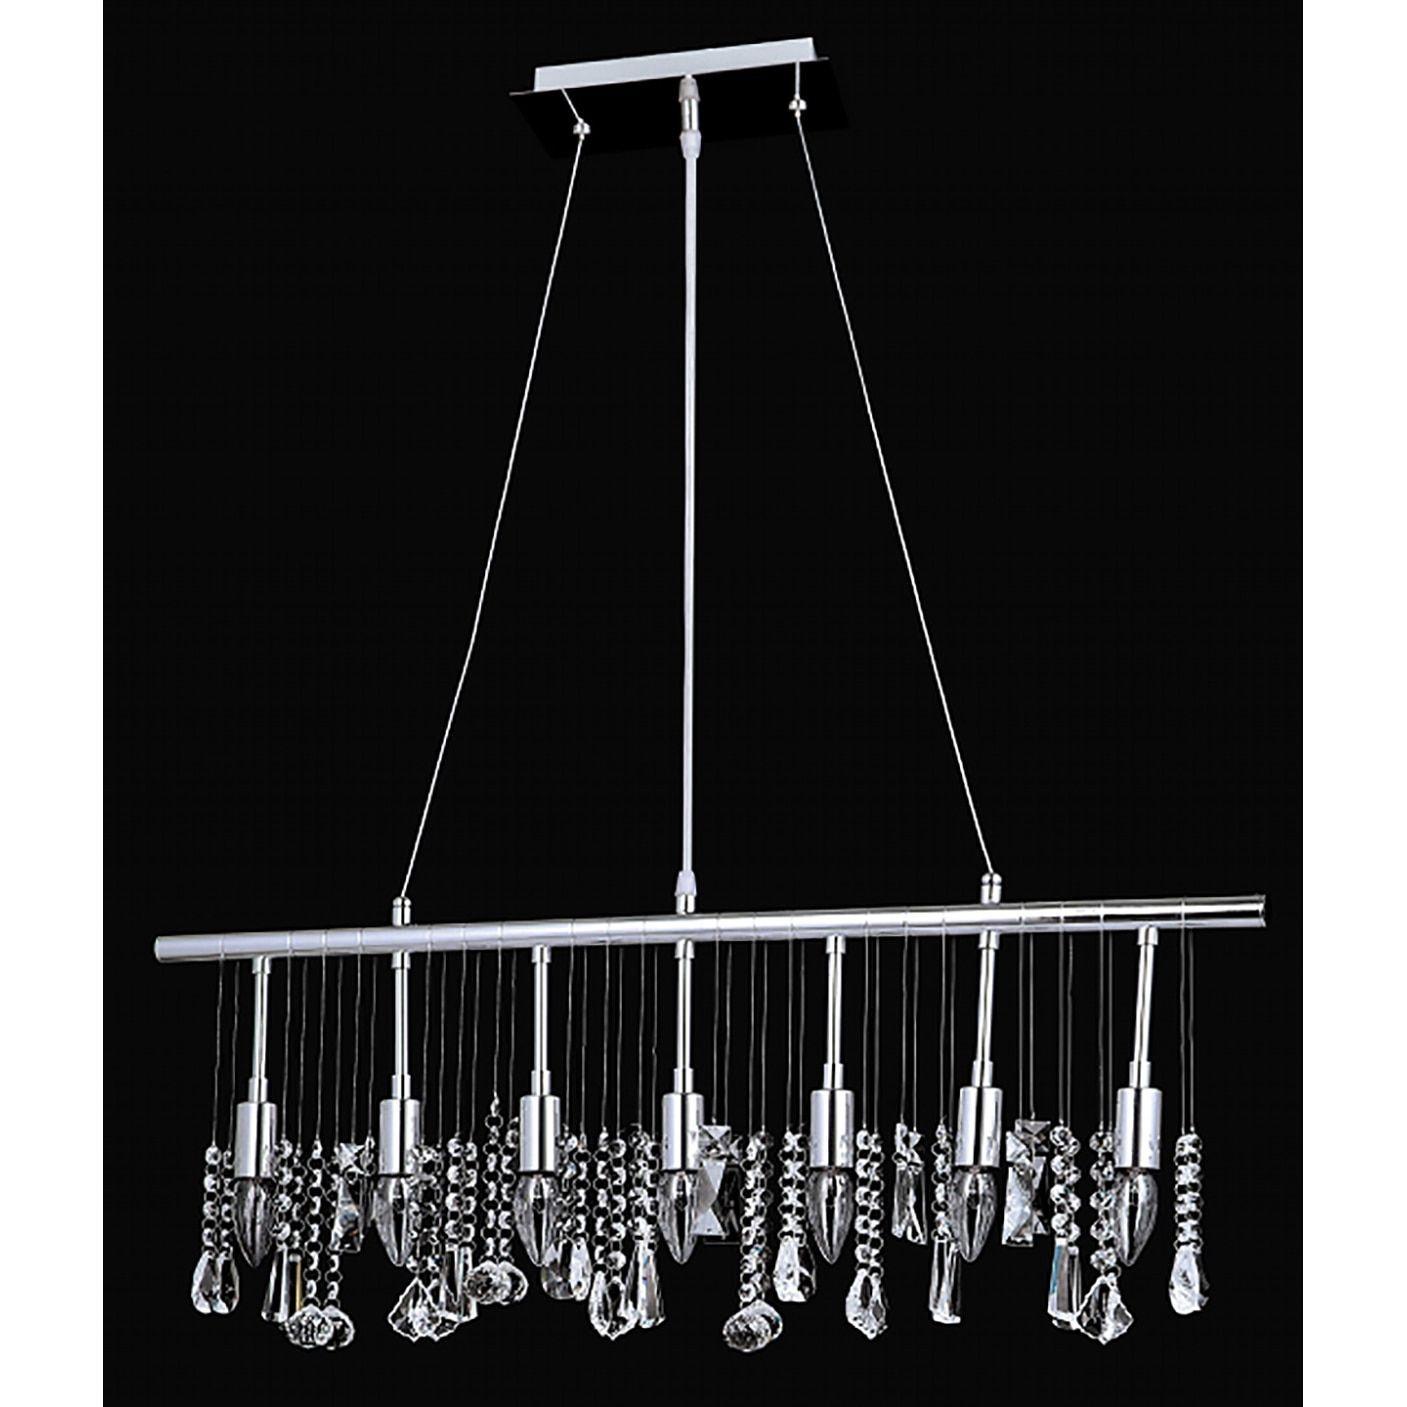 Chorus Line Collection 8015-300640L7 Chrome-finish Steel/Crystal 7-light Chandelier (Chrome (Grey))